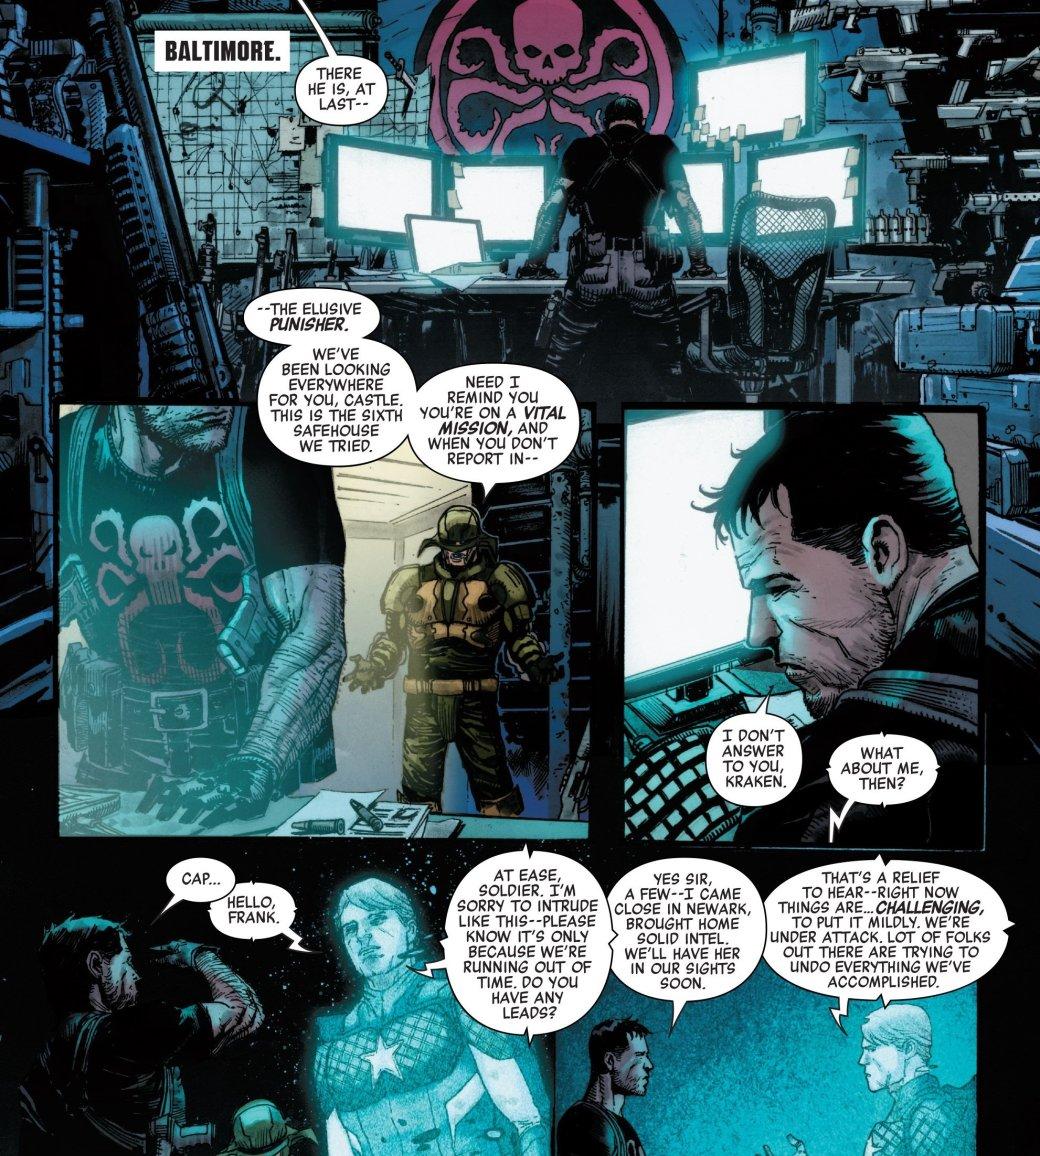 Secret Empire: противостоянию Стива Роджерса иТони Старка нет конца - Изображение 26